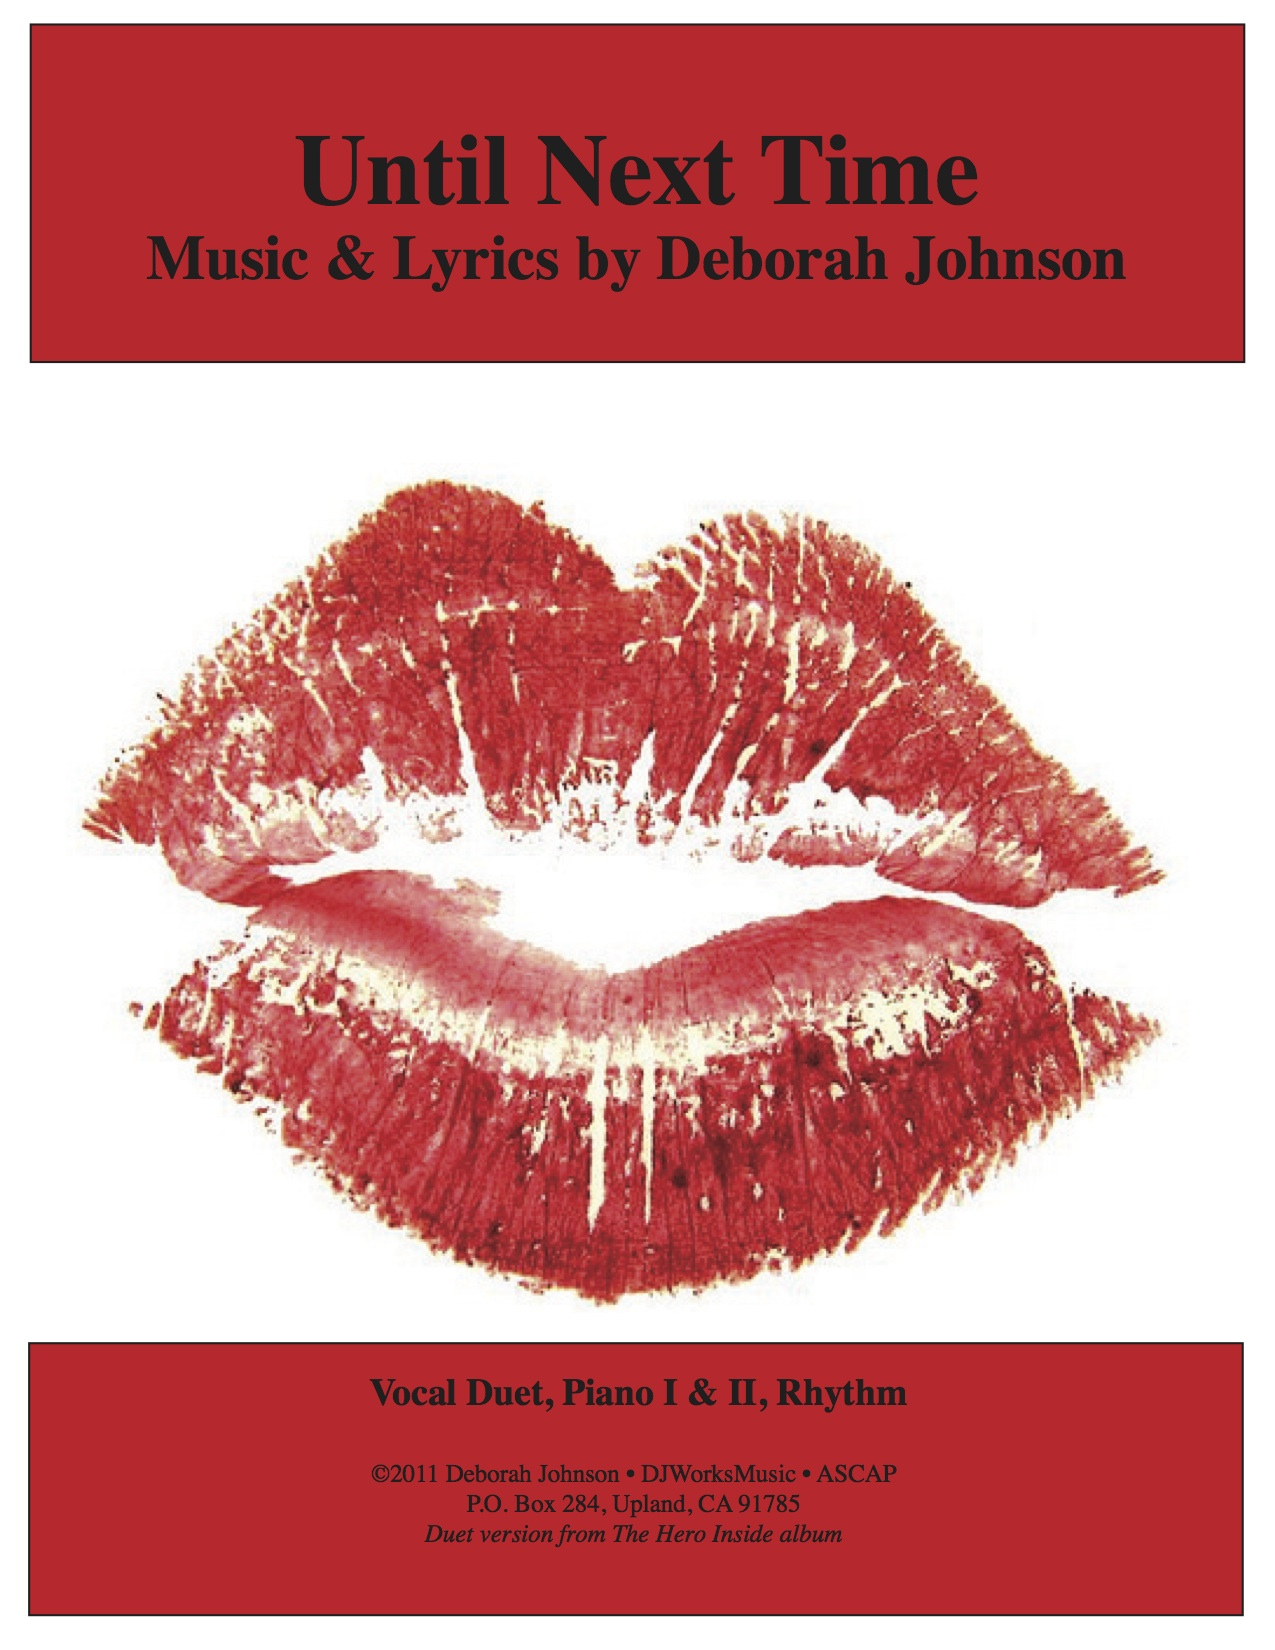 Until Next Time-Deborah Johnson